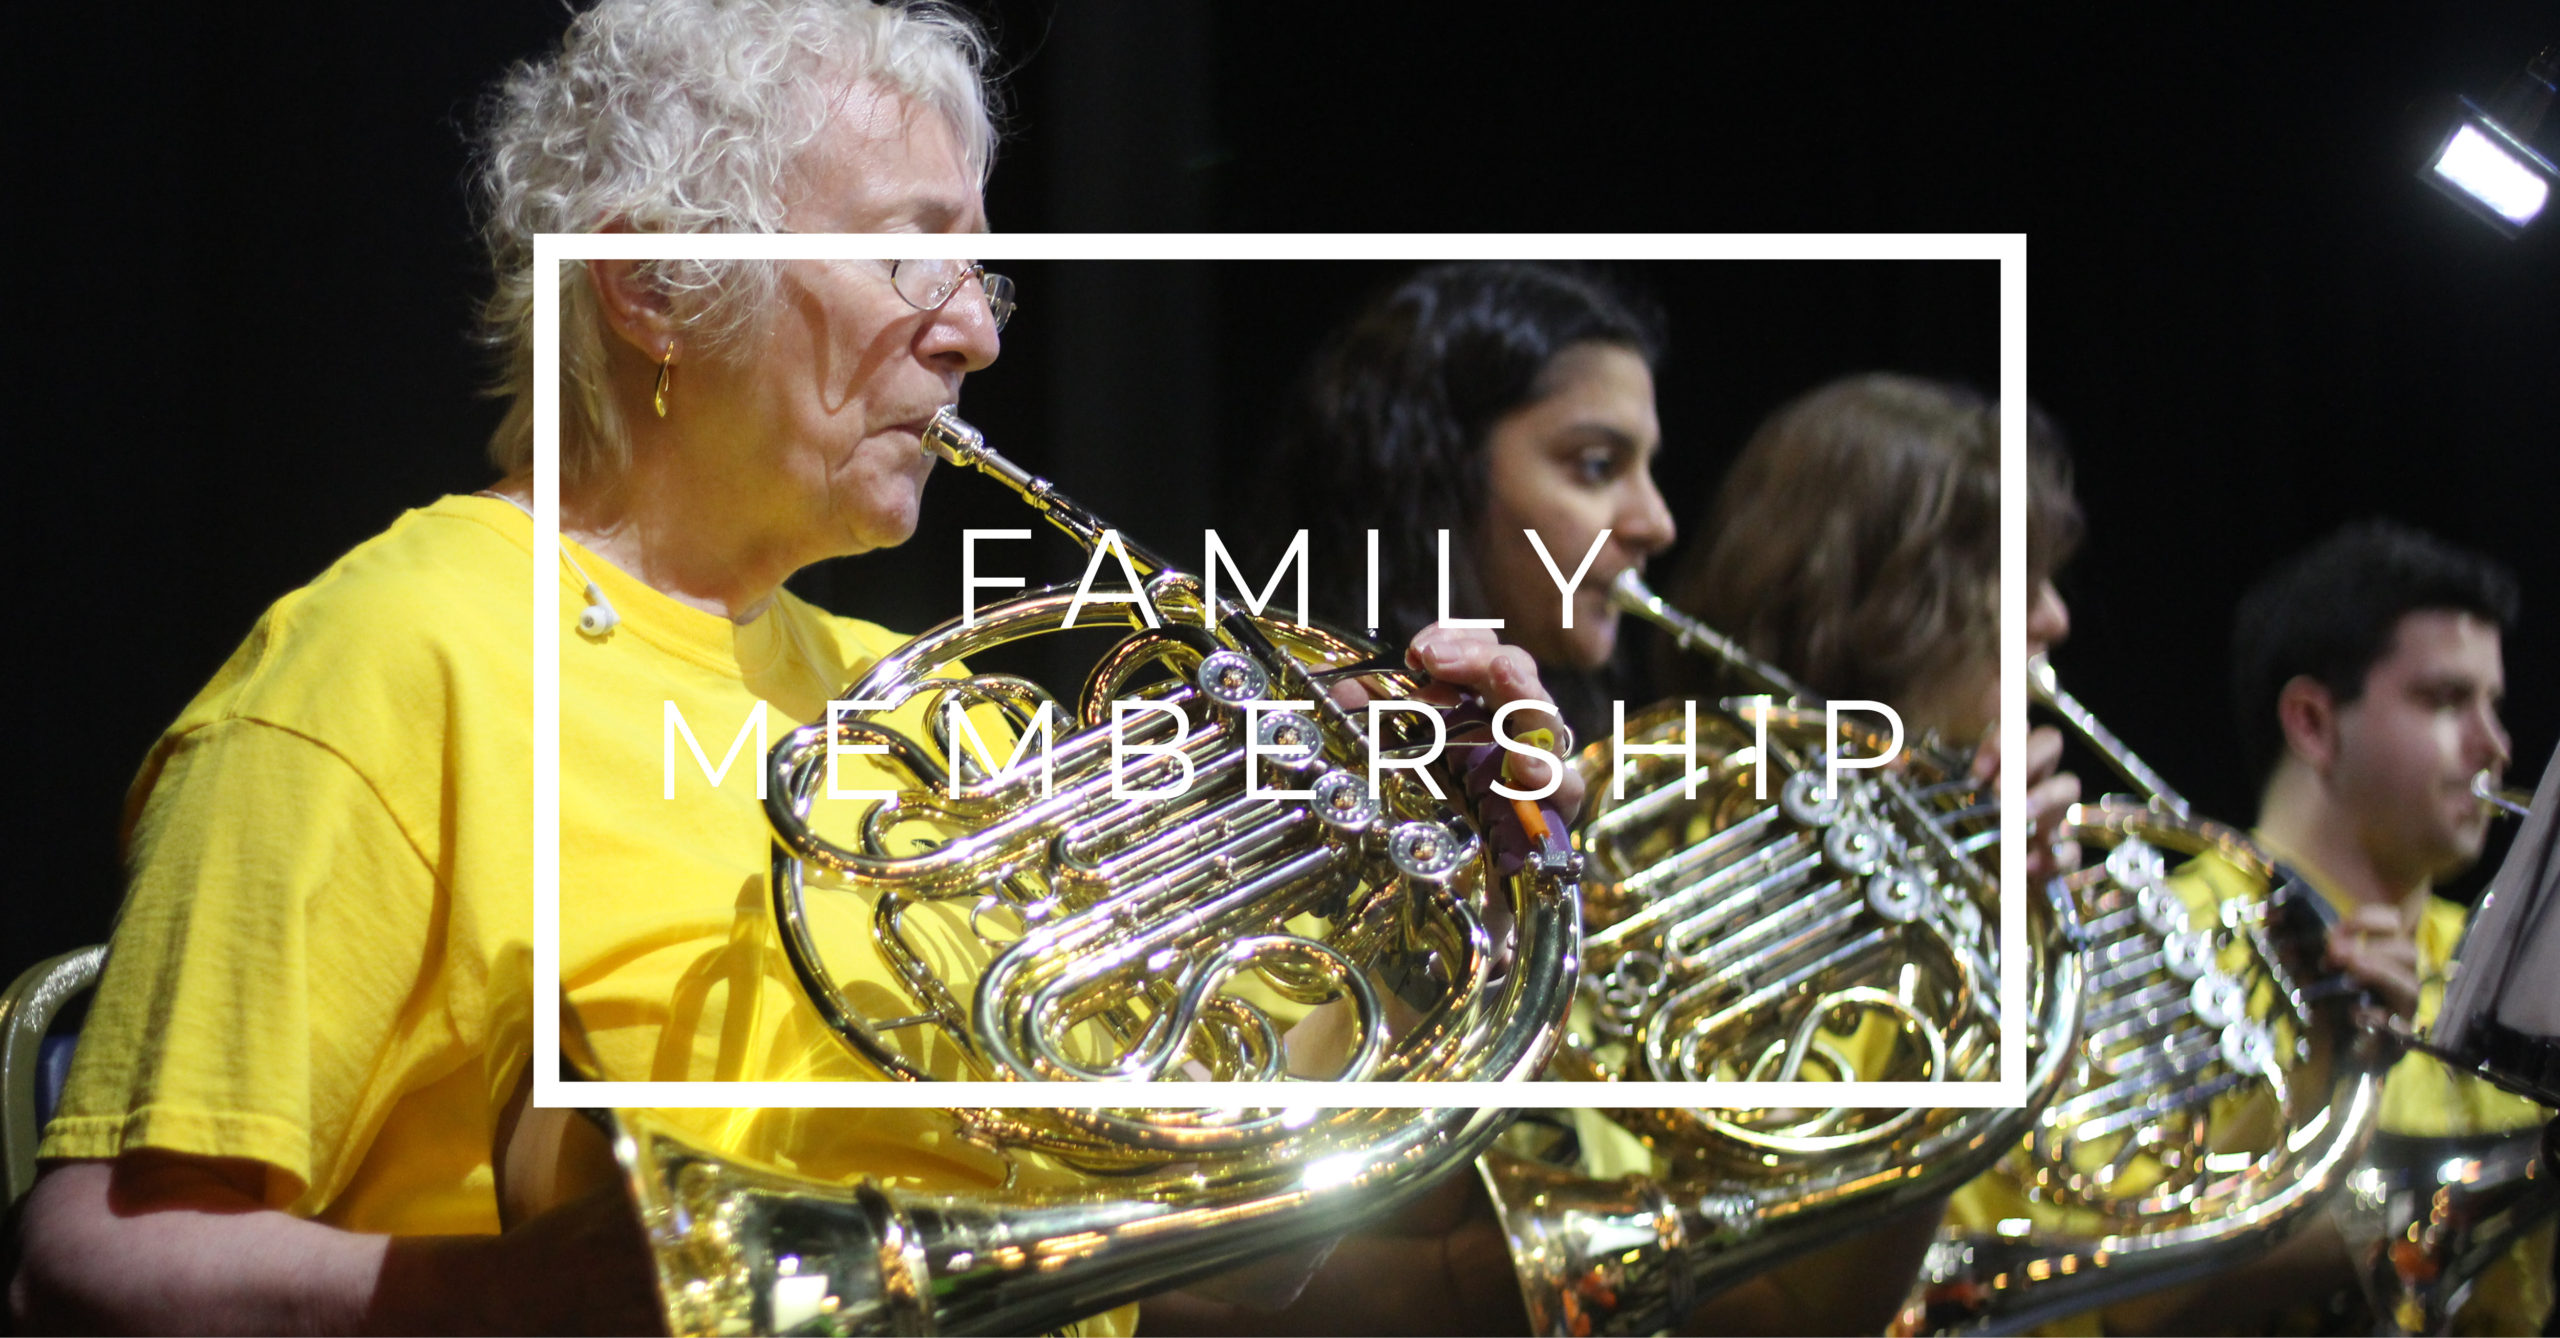 Orchestra Membership – Family